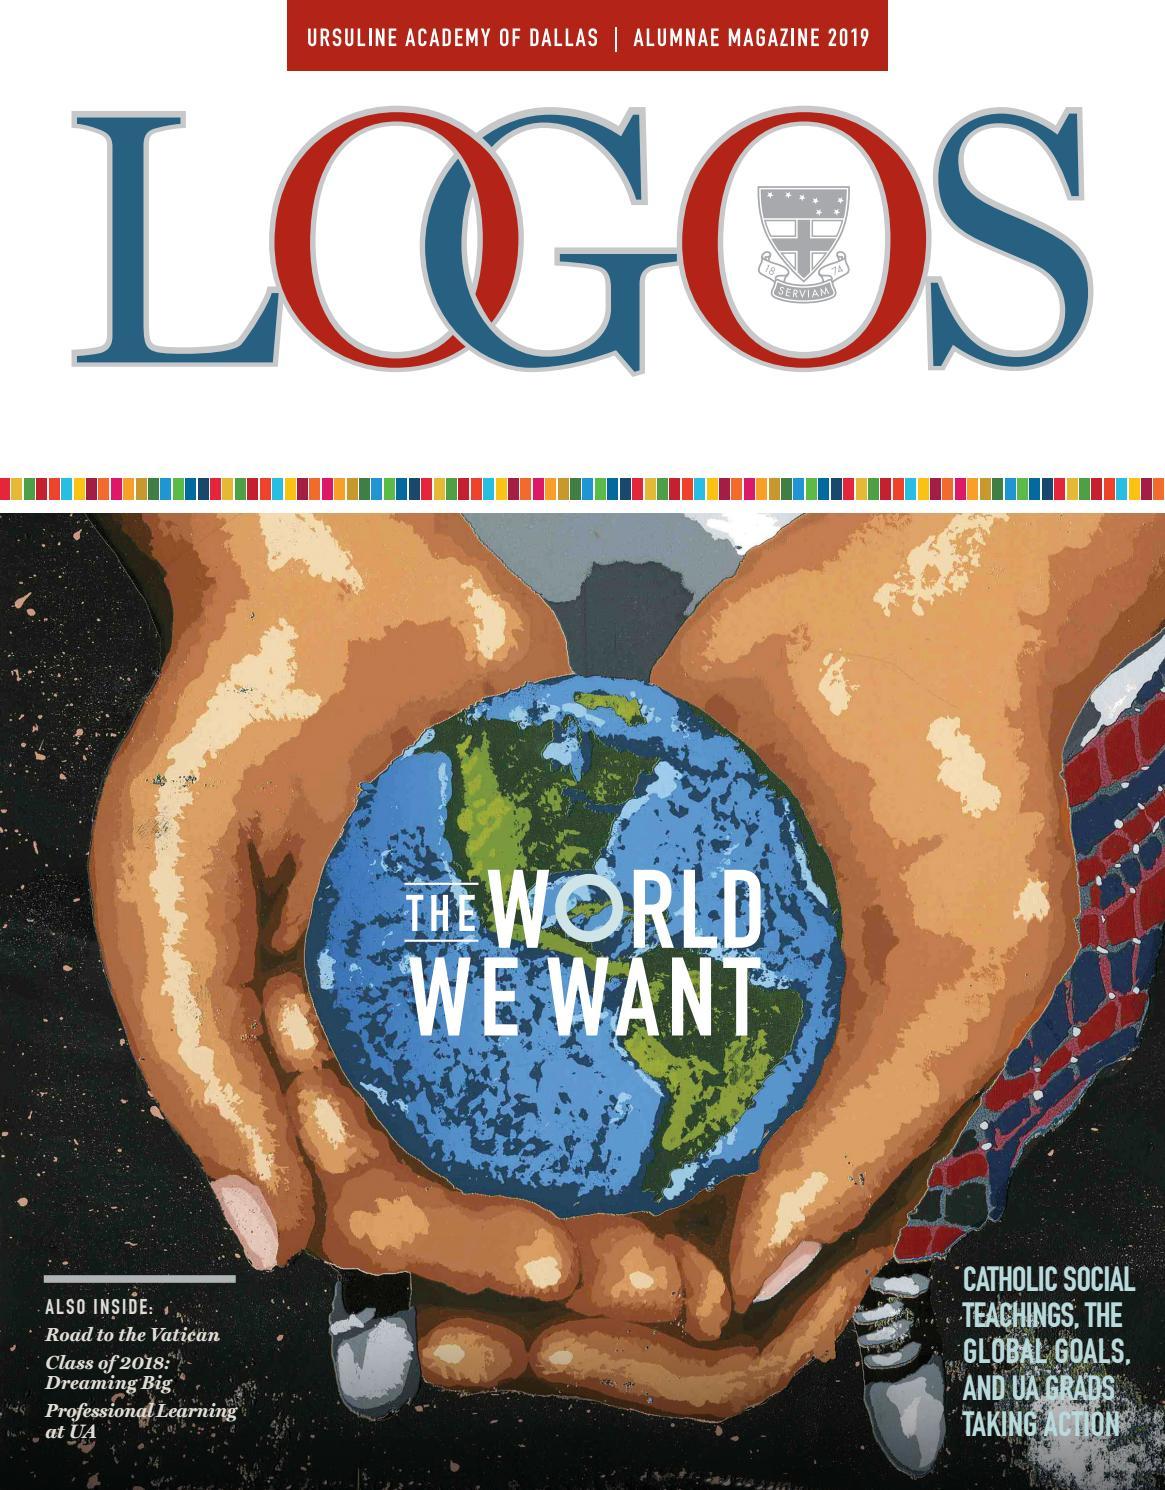 Ursuline Academy of Dallas LOGOS 2019 Magazine by Ursuline Academy of Dallas  - issuu